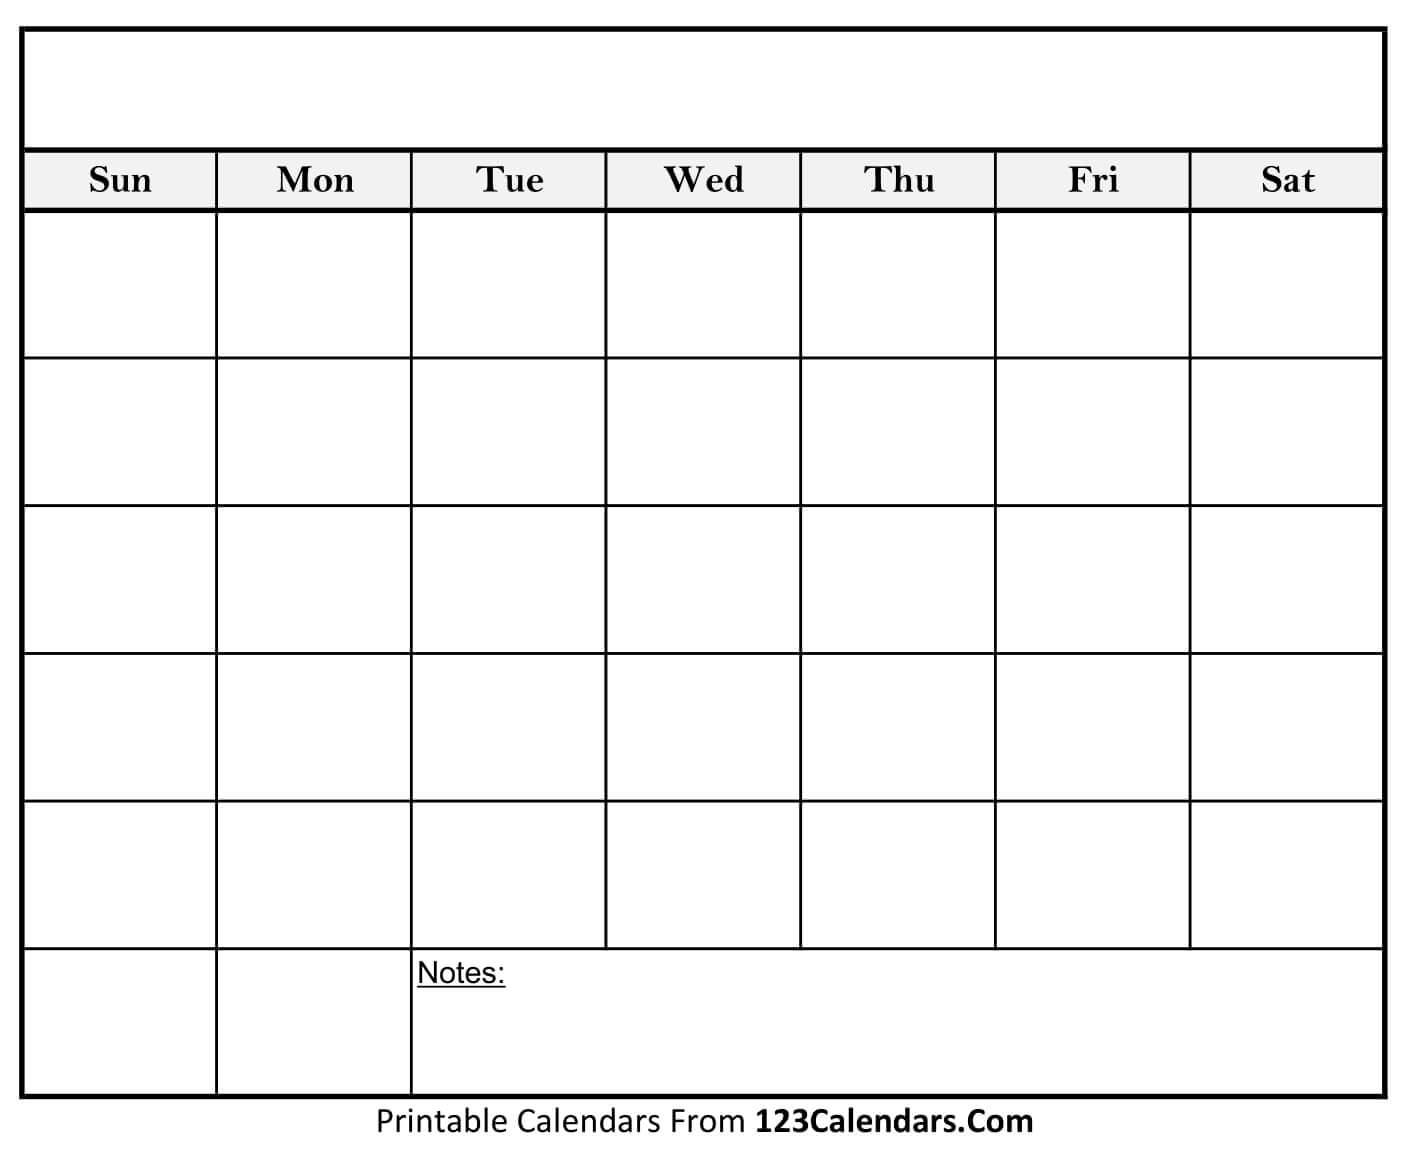 Free Printable Blank Calendar   123Calendars in Blank Calendar Template With Lines